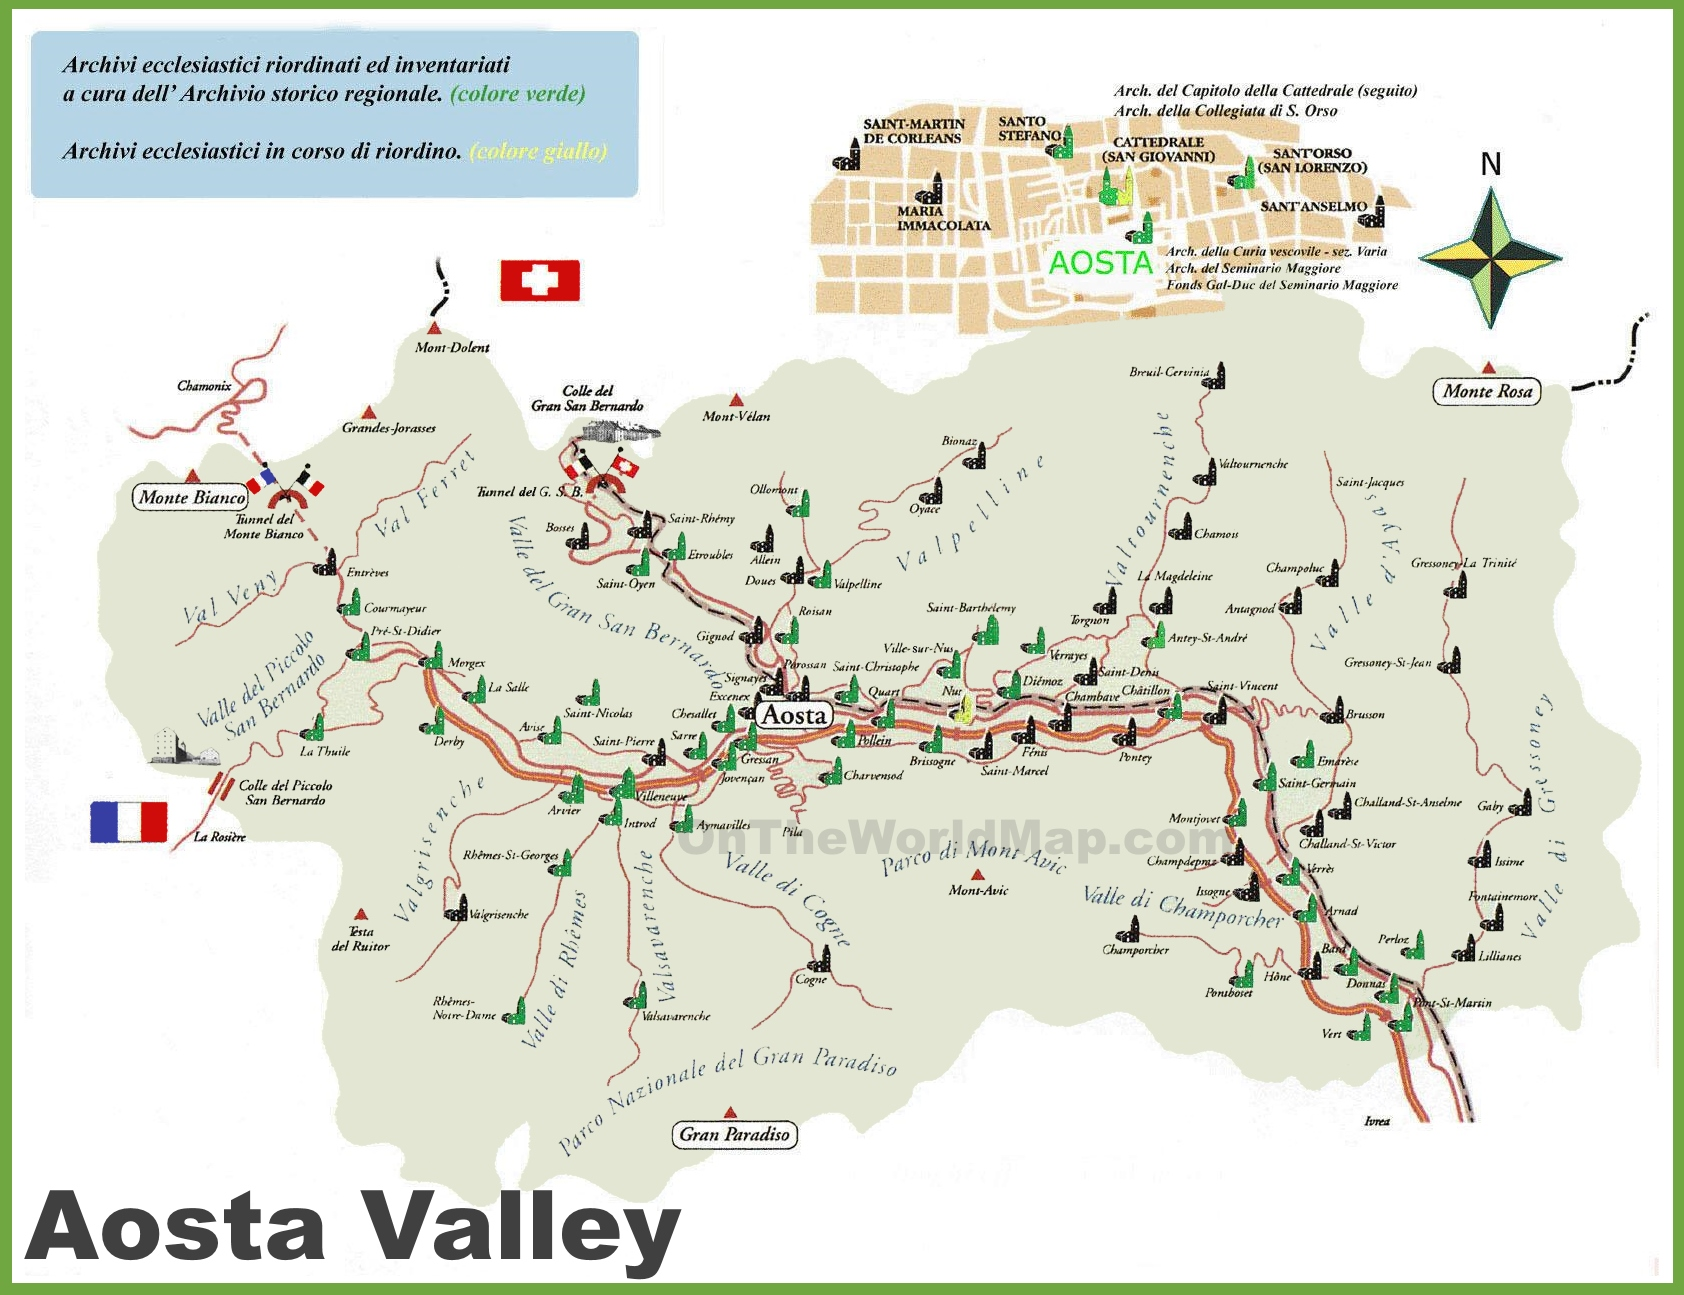 map of aosta